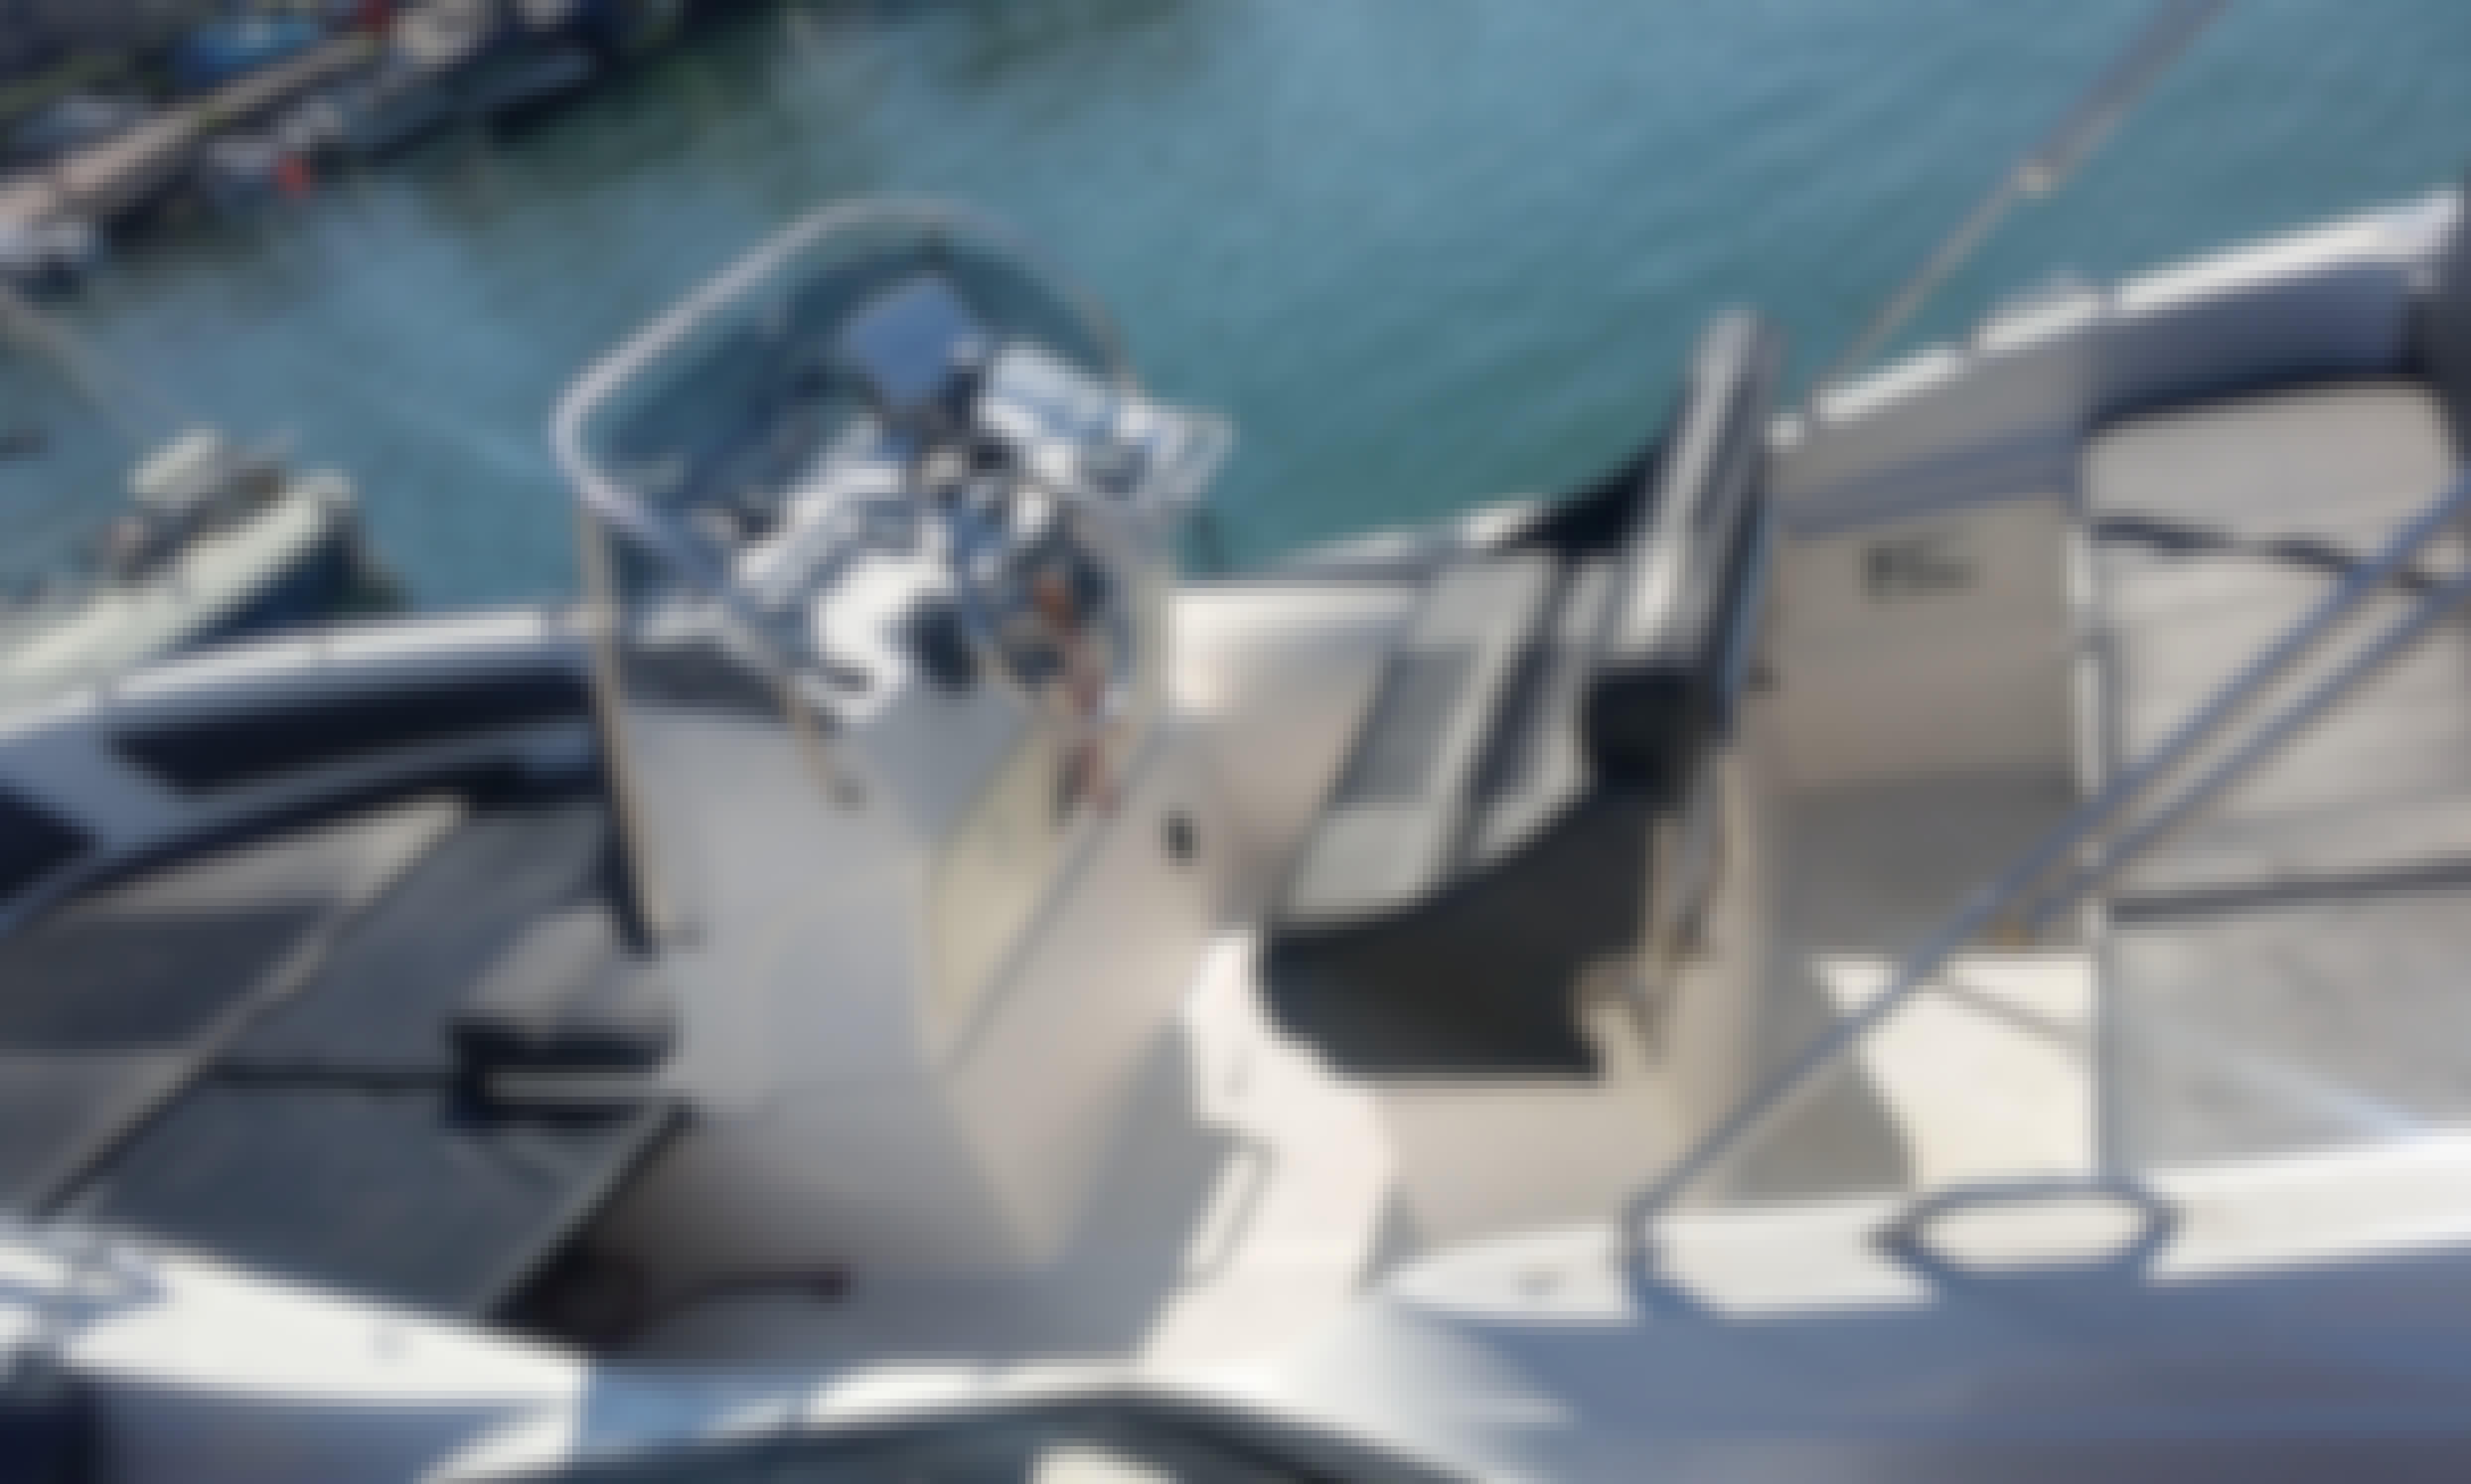 23' Zar Formenti 6.1 Plus RIB Boat in Patitiri Pport